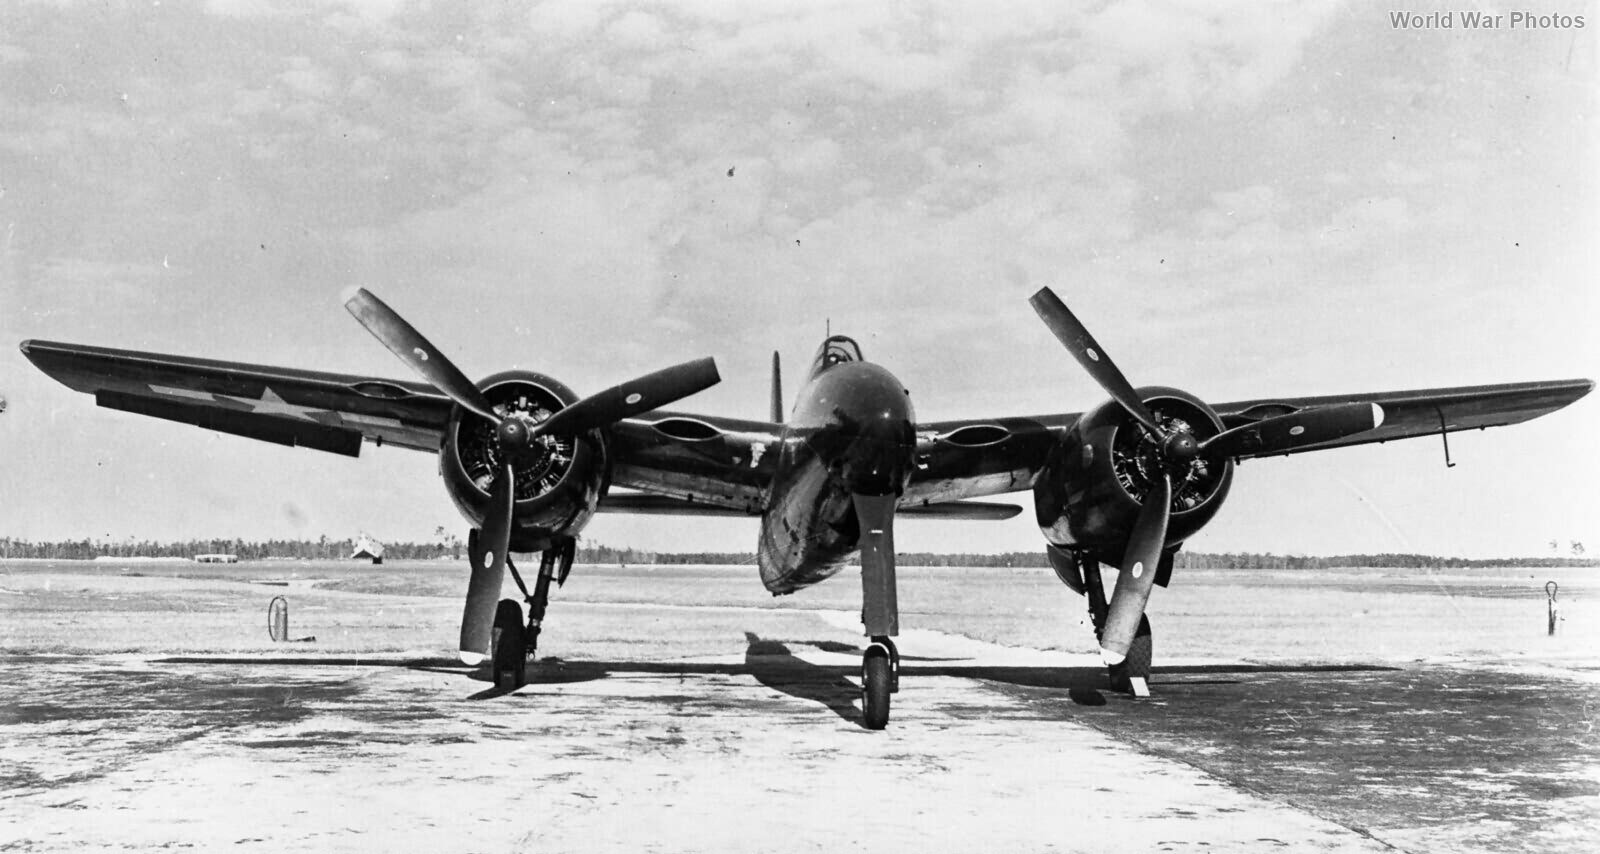 Heavy fighter Grumman F7F front view